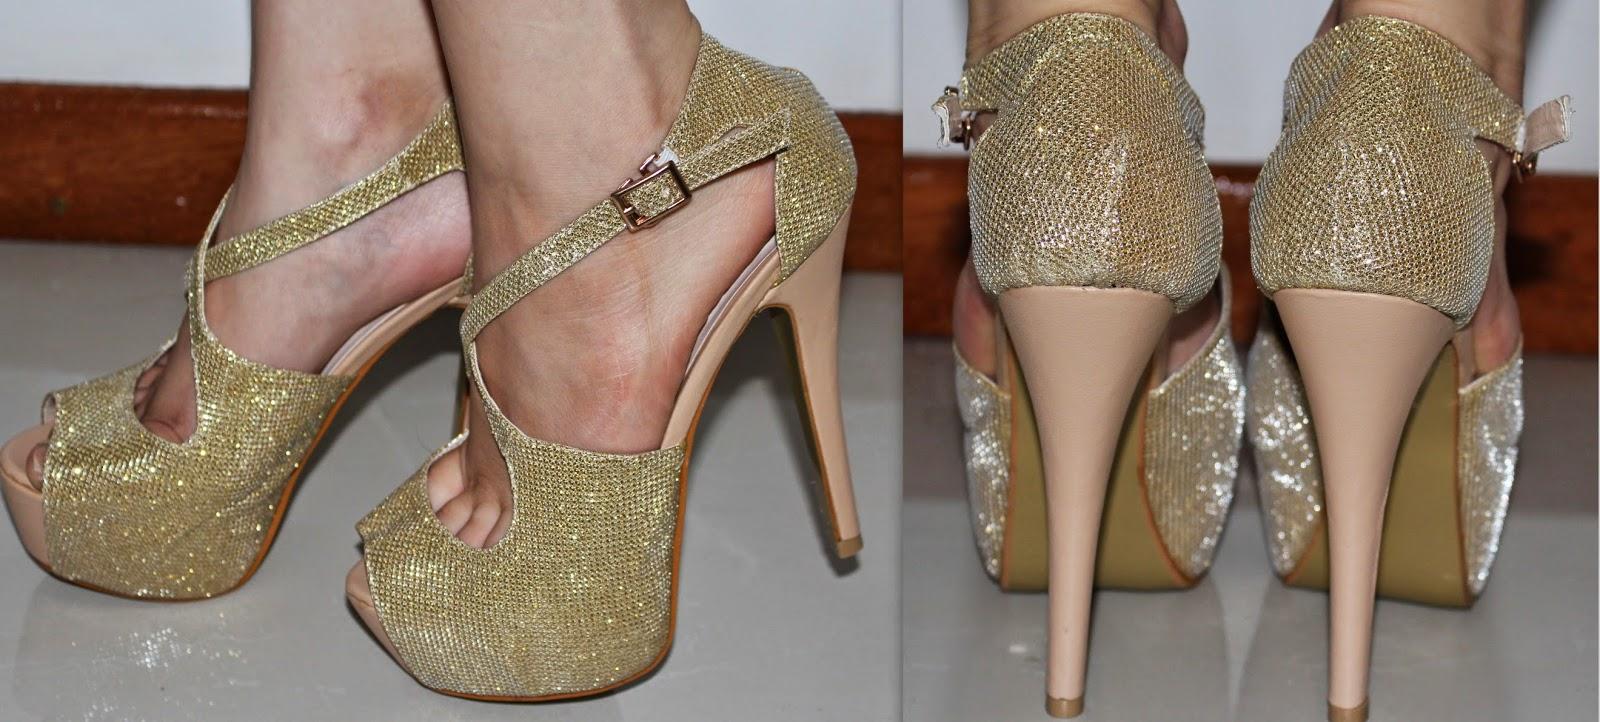 http://www.martofchina.com/sparkly-luxury-gold-slim-heel-cross-strap-sandals-g87008.html?lkid=657